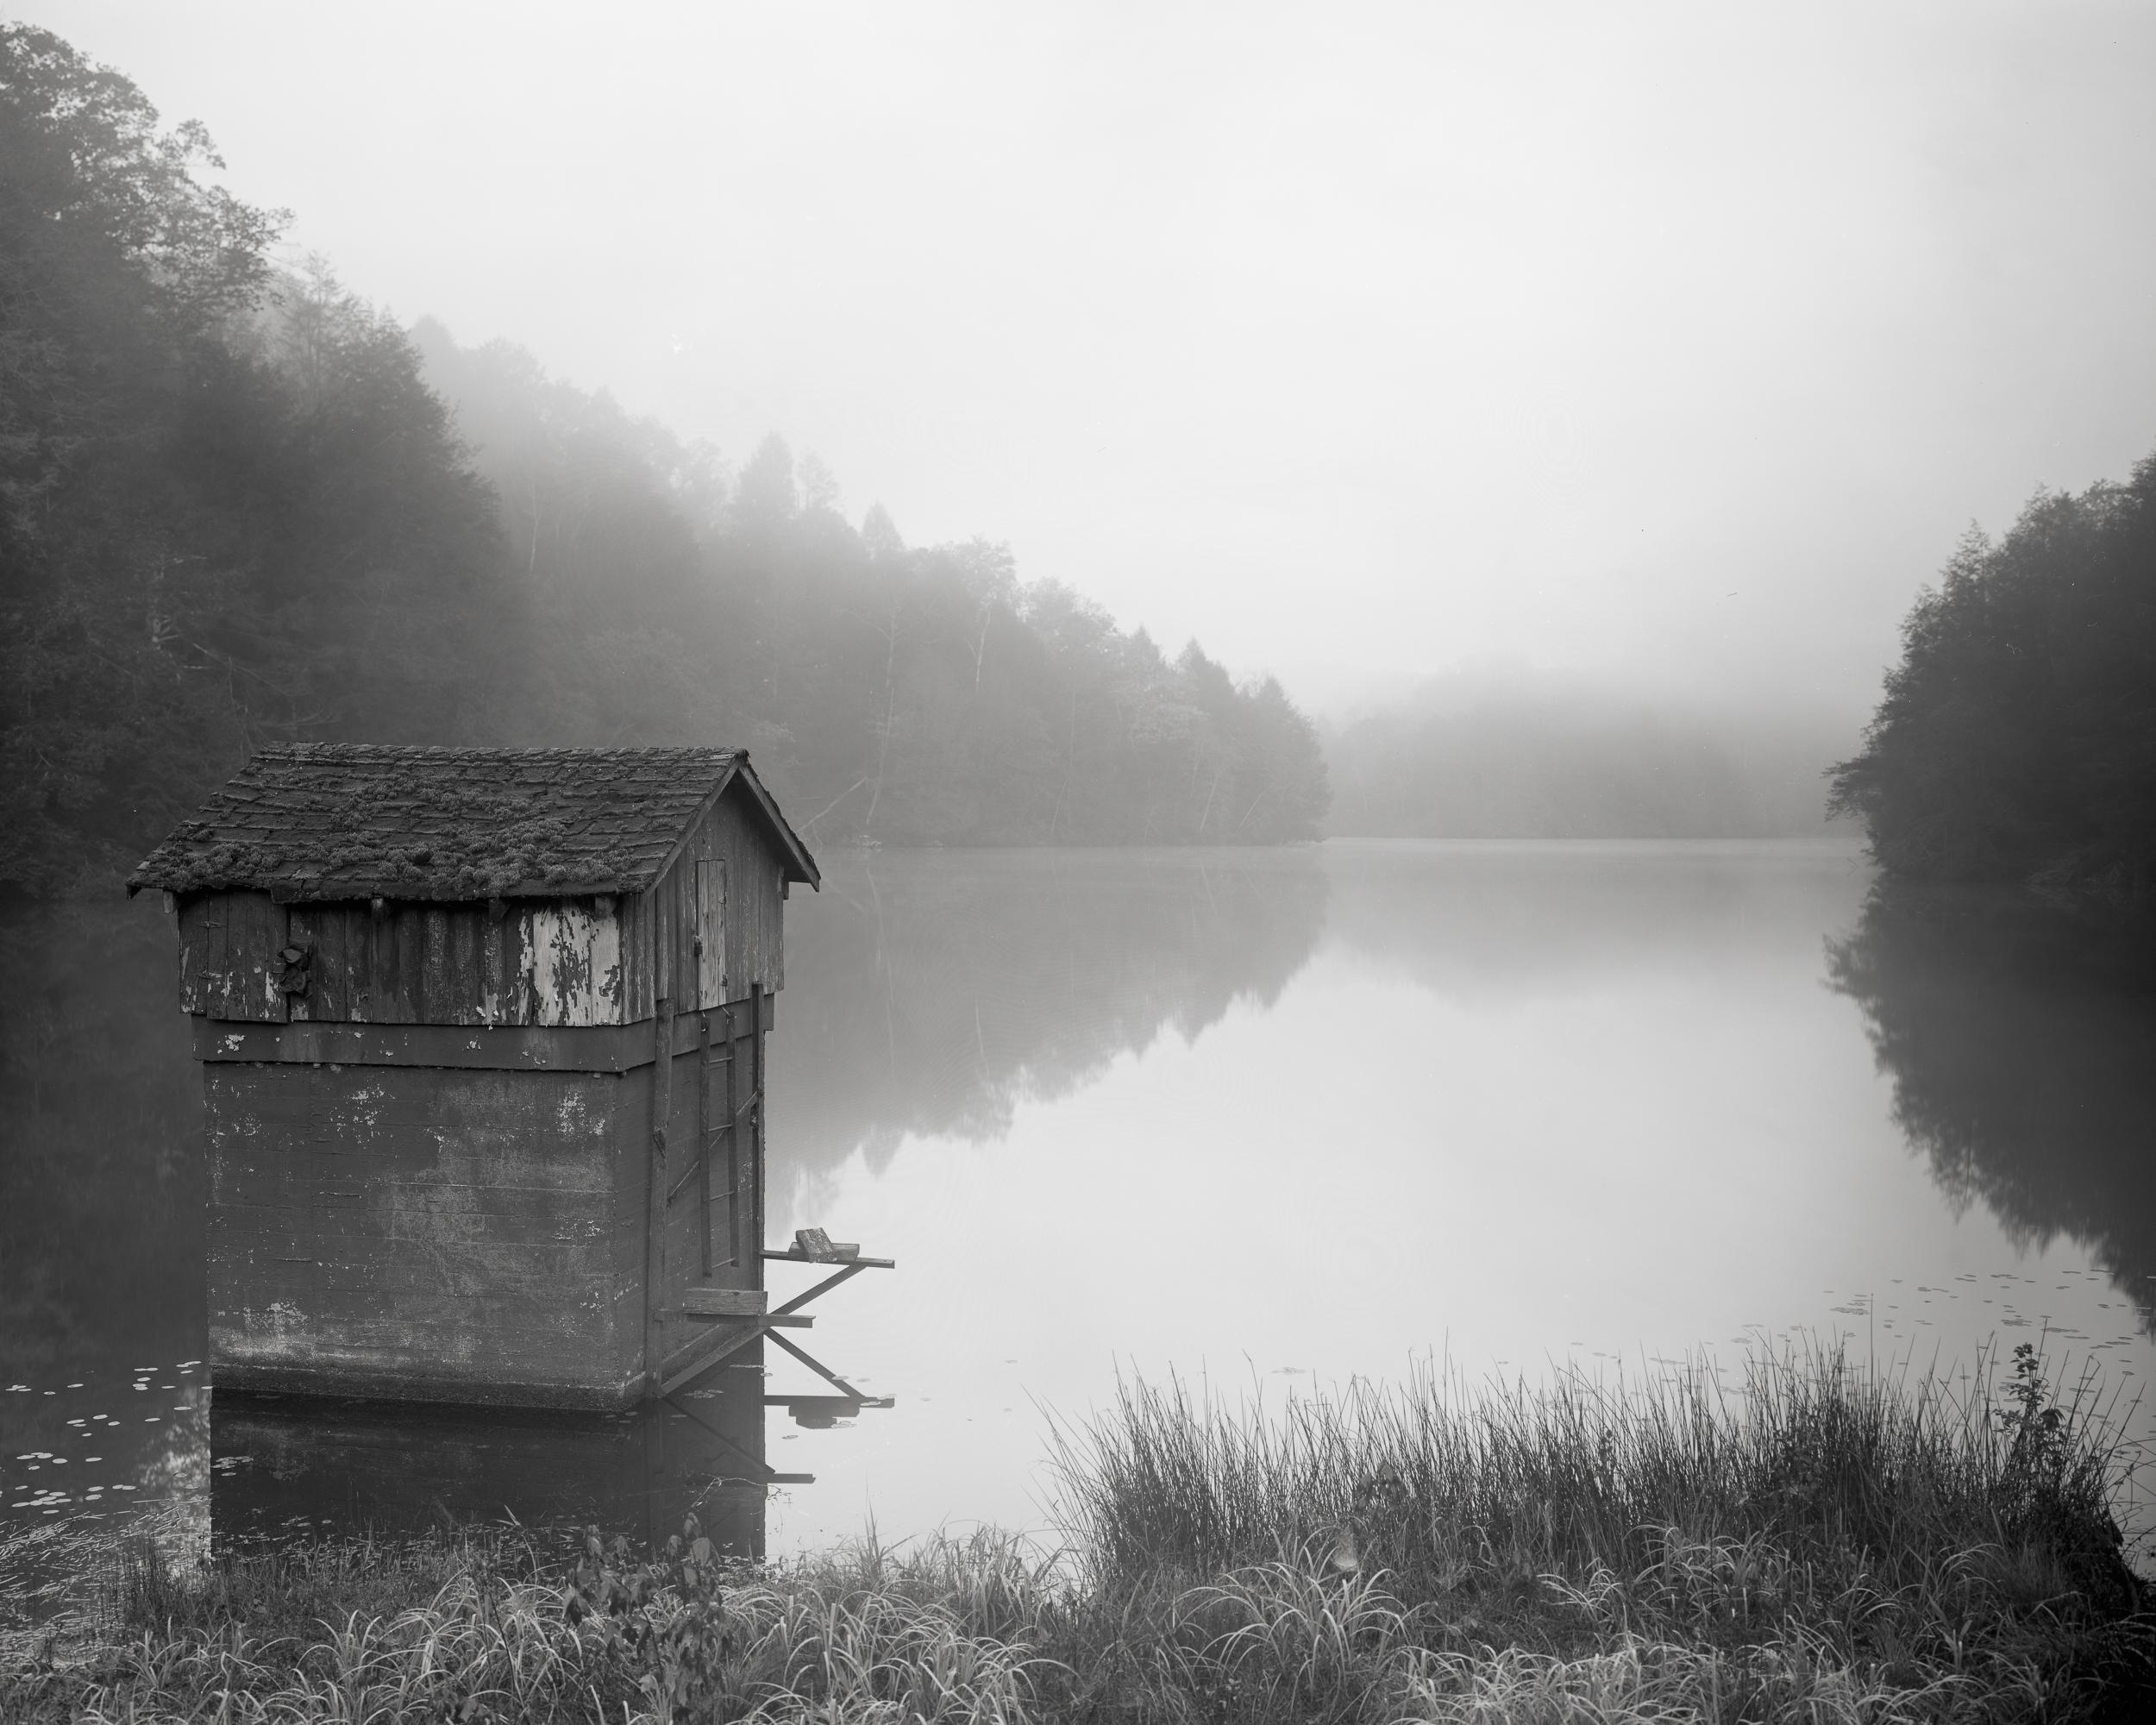 Lake_Katherine_003.jpg